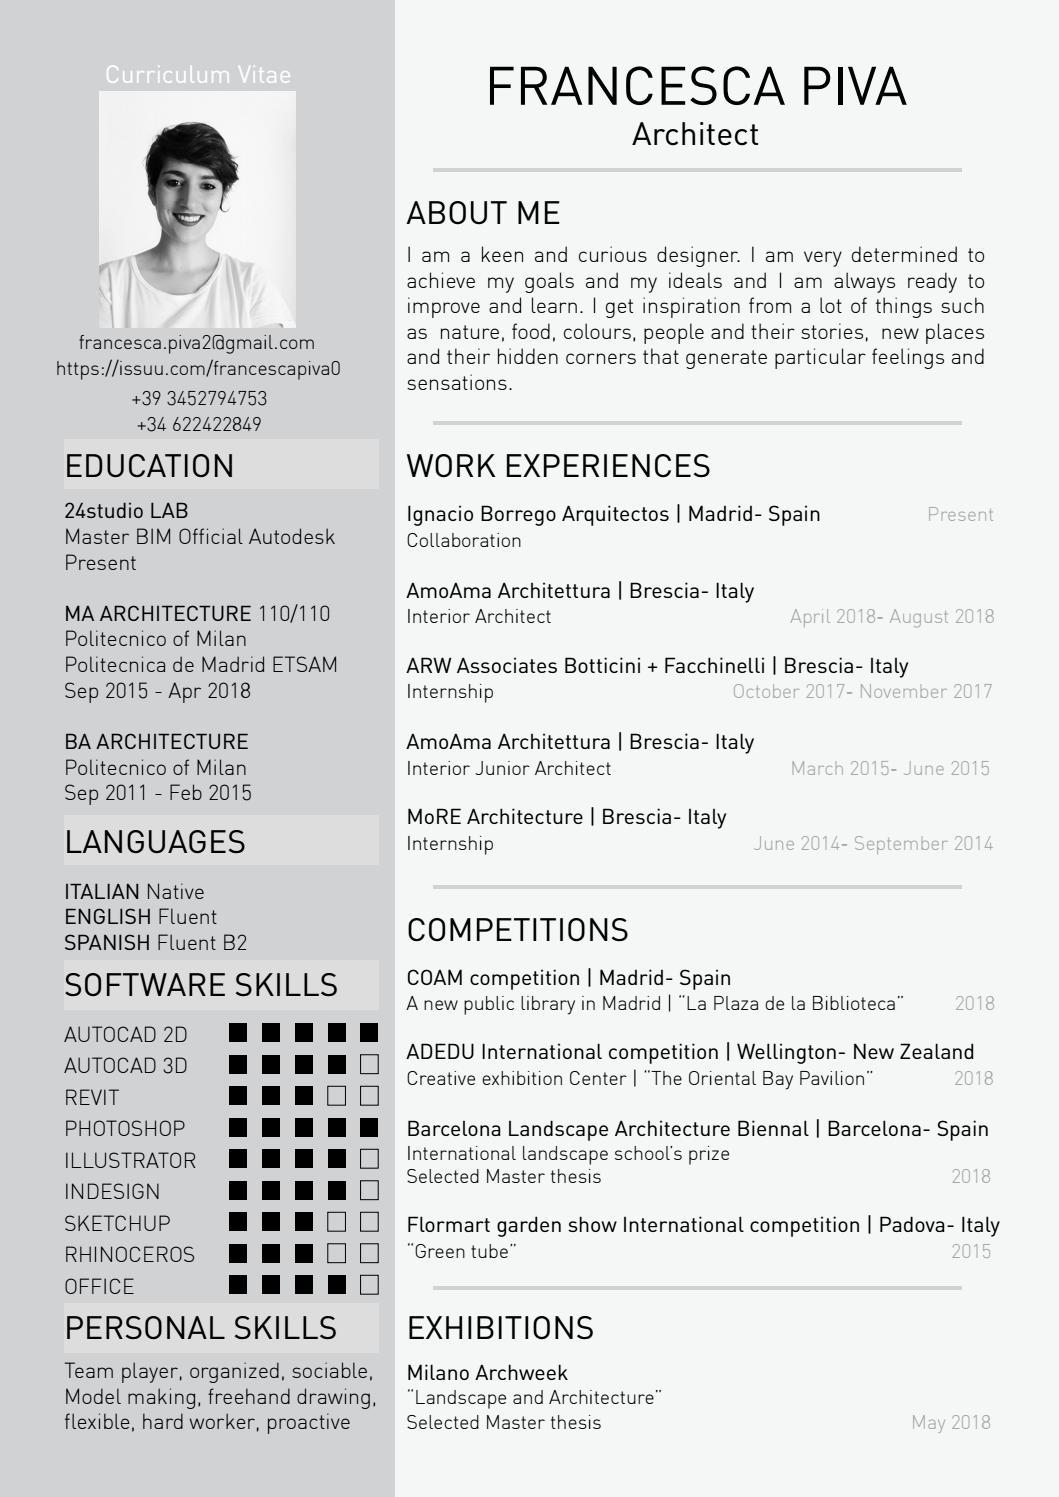 curriculum vitae 2019 by francesca piva